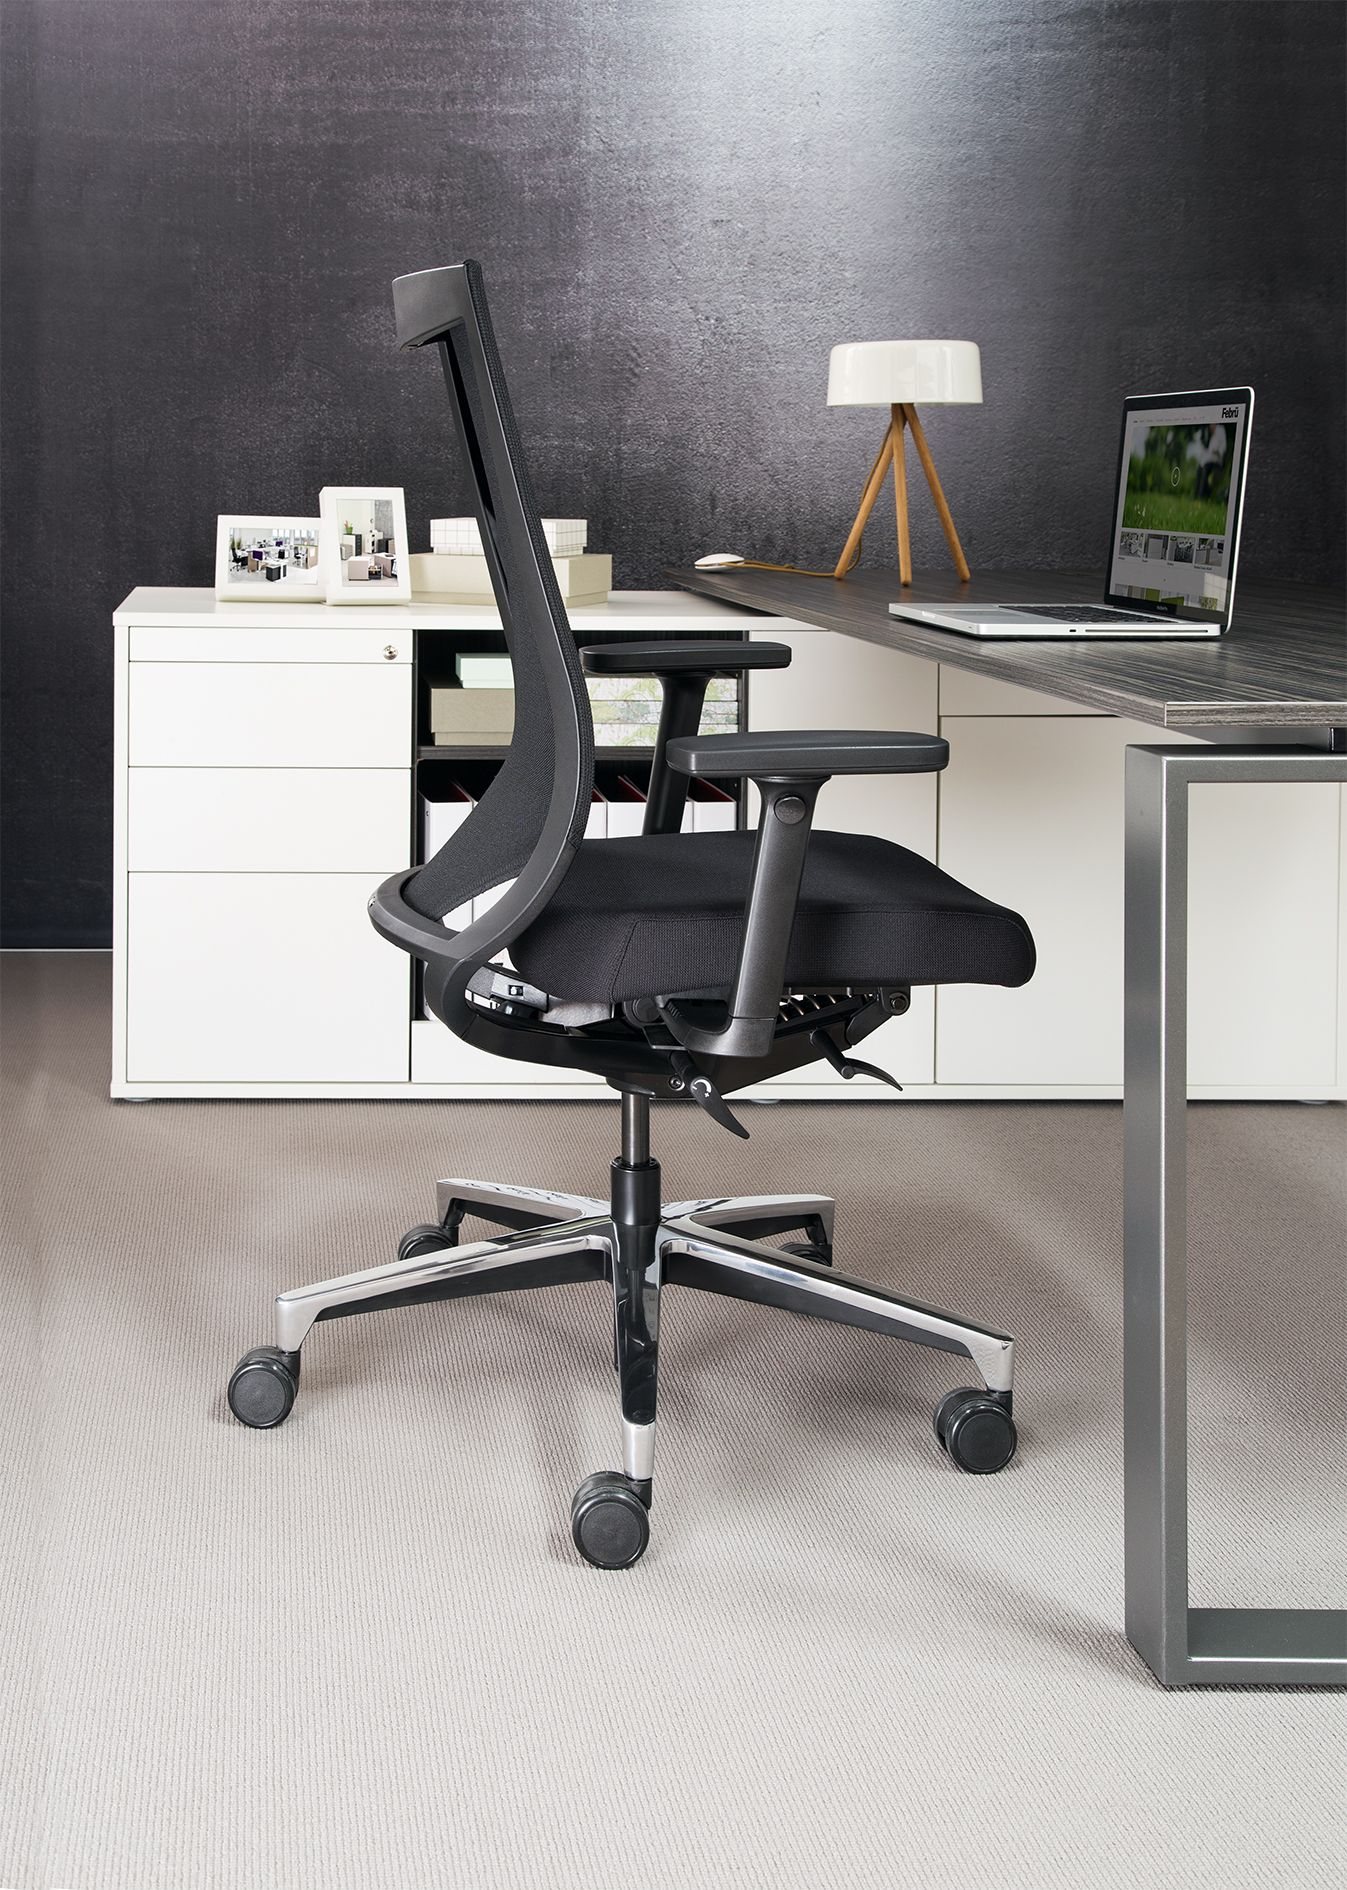 Der ergonomische Bürodrehstuhl Febrü One lässt genügend ...